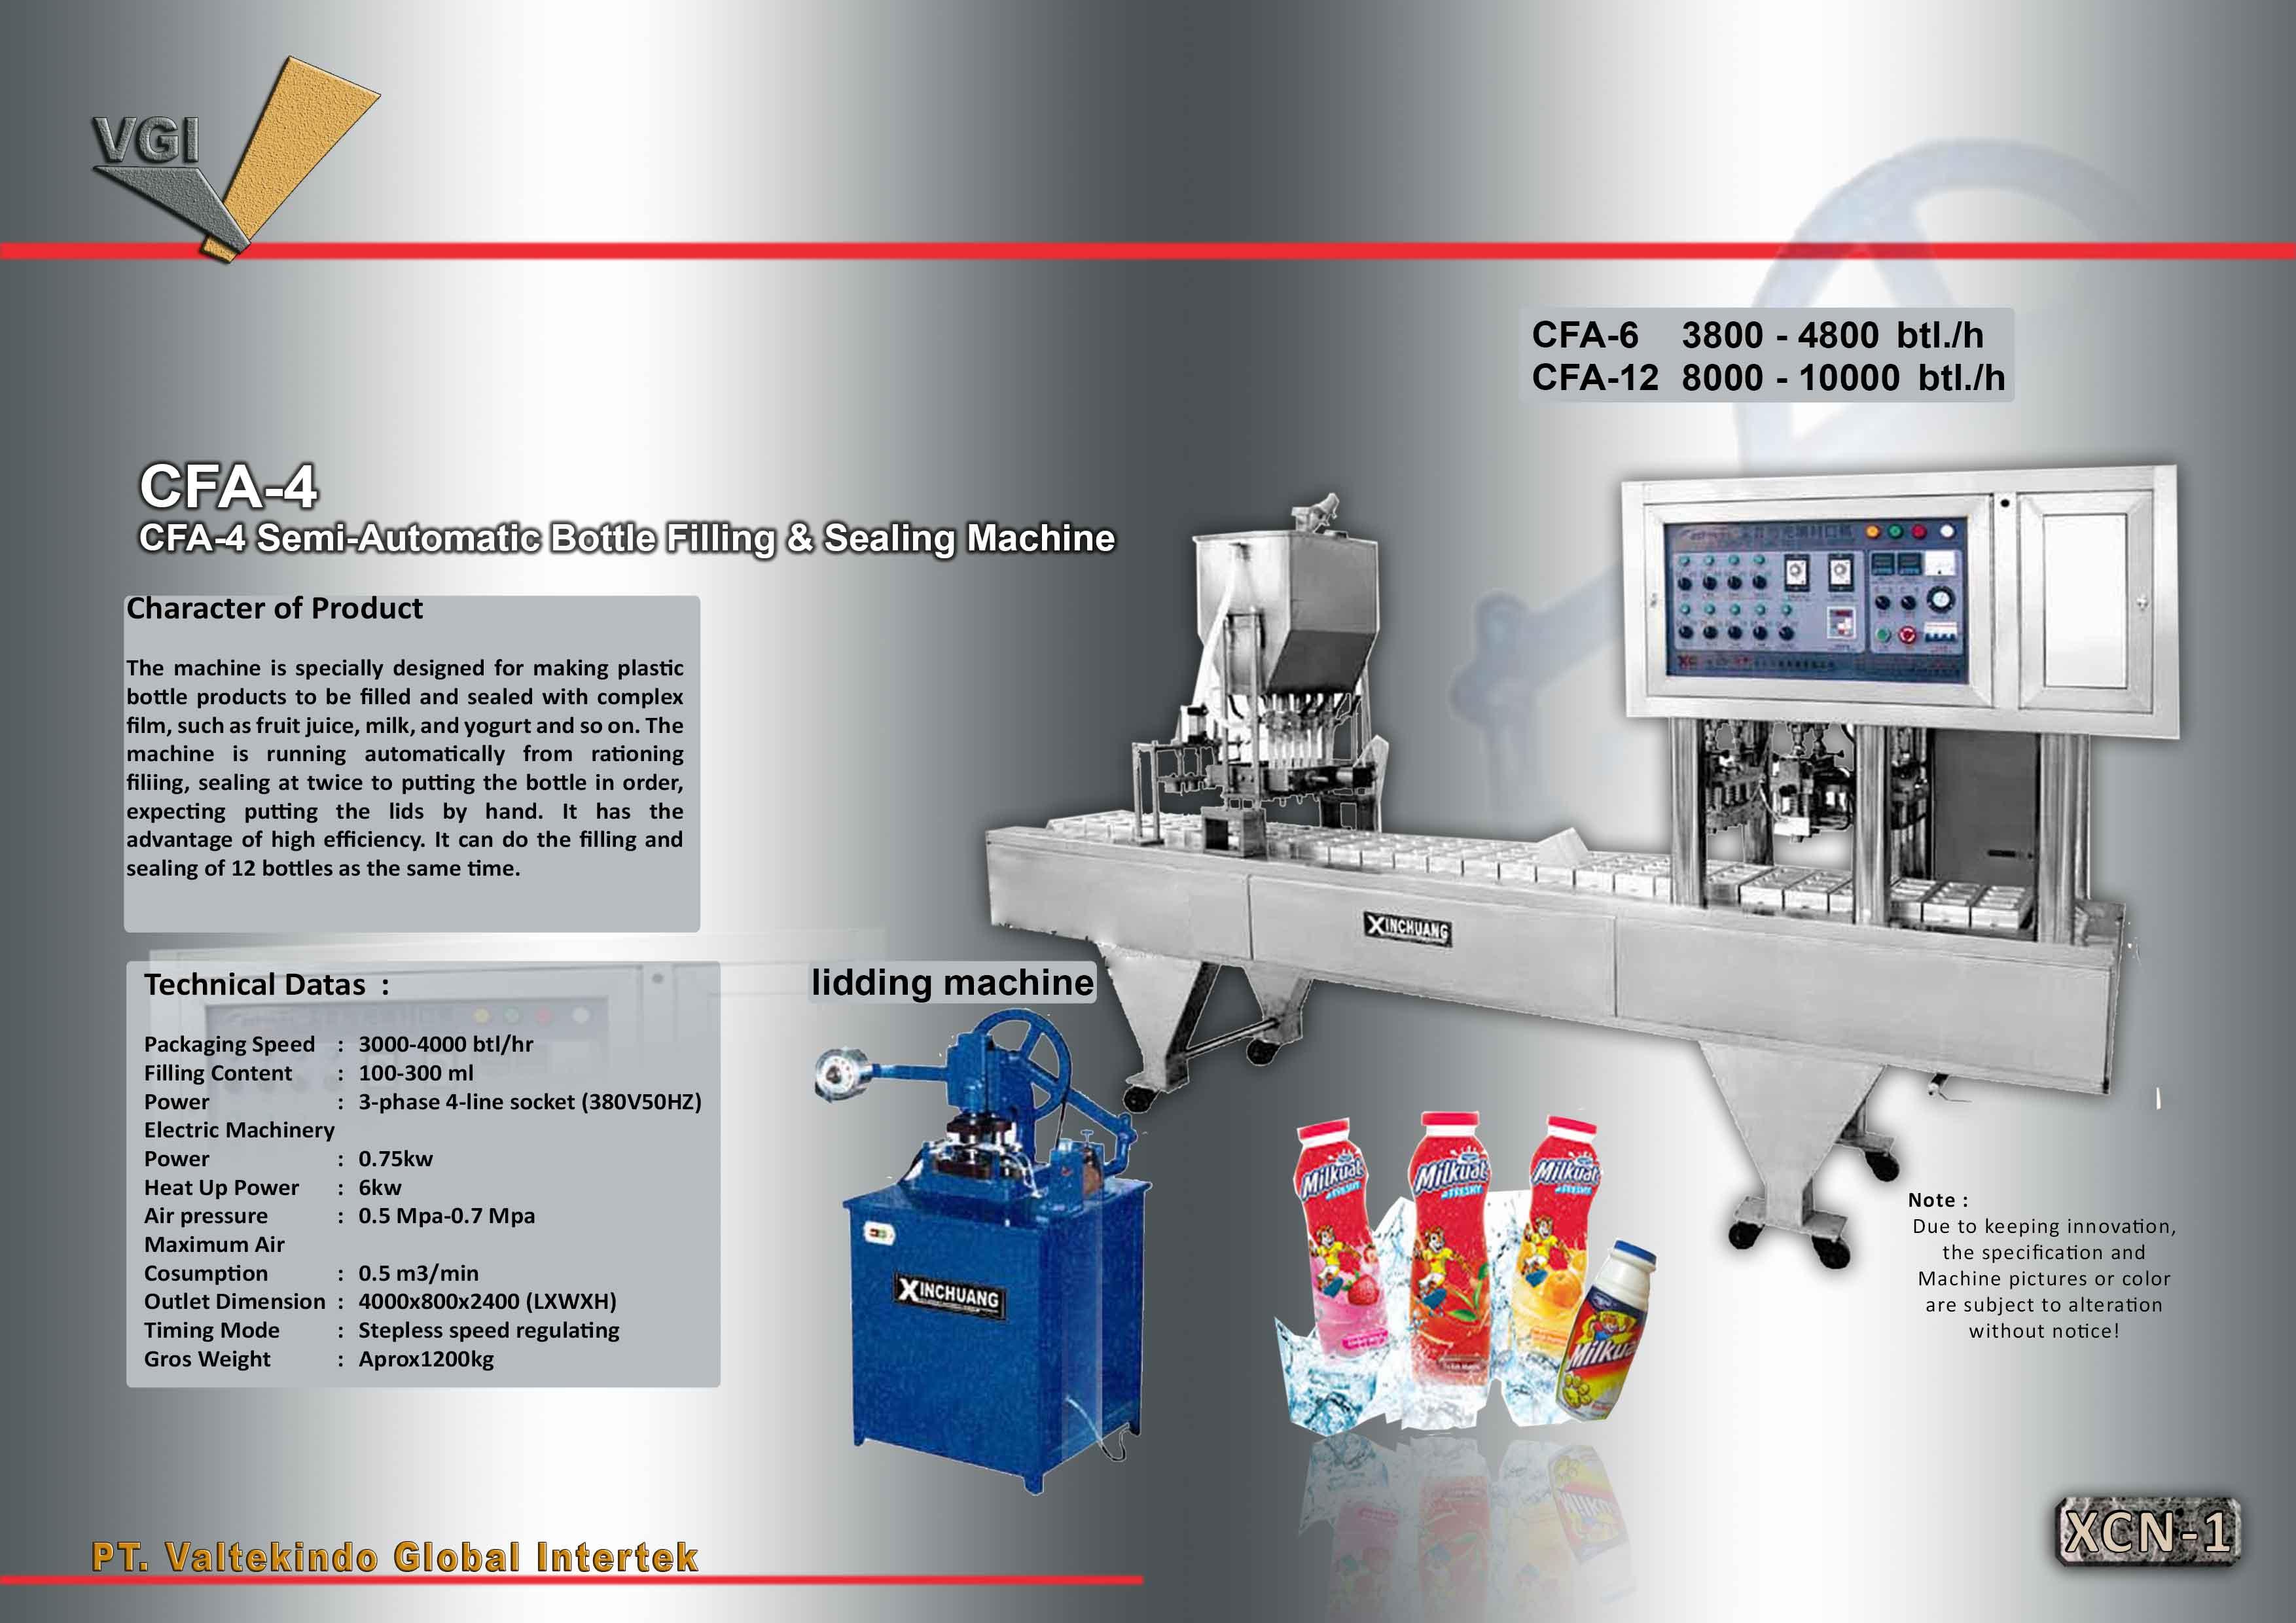 jual mesin semi Automatic Bottle Filling & Sealing Machine semi Automatic Bottle Filling & Sealing Machine